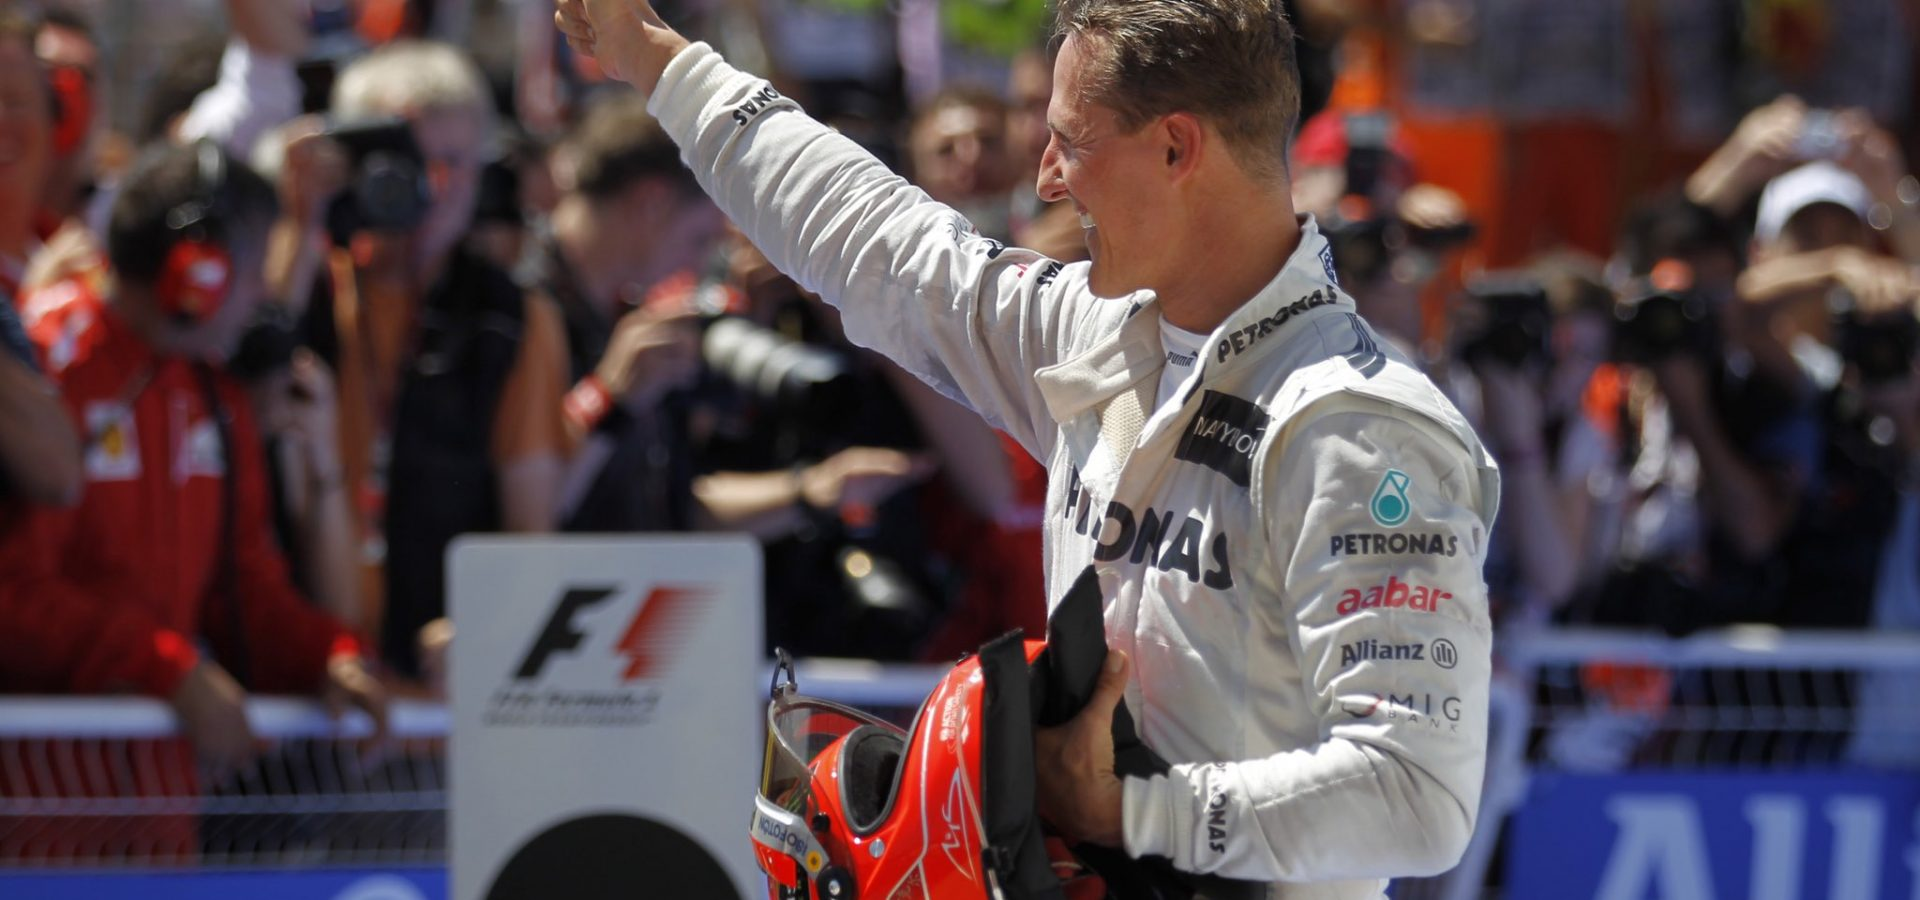 Michael Schumacher, 2012, European Grand Prix, Valencia, Mercedes, His last podium